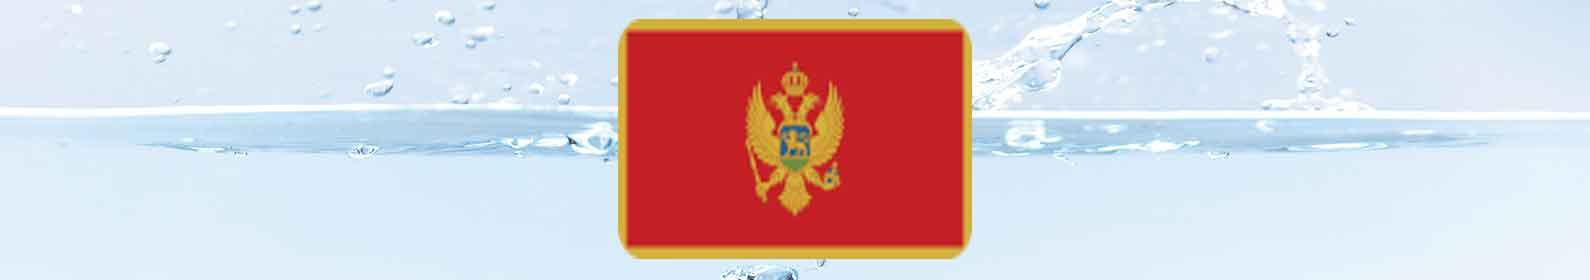 tratamento-de-agua-montenegro.jpg